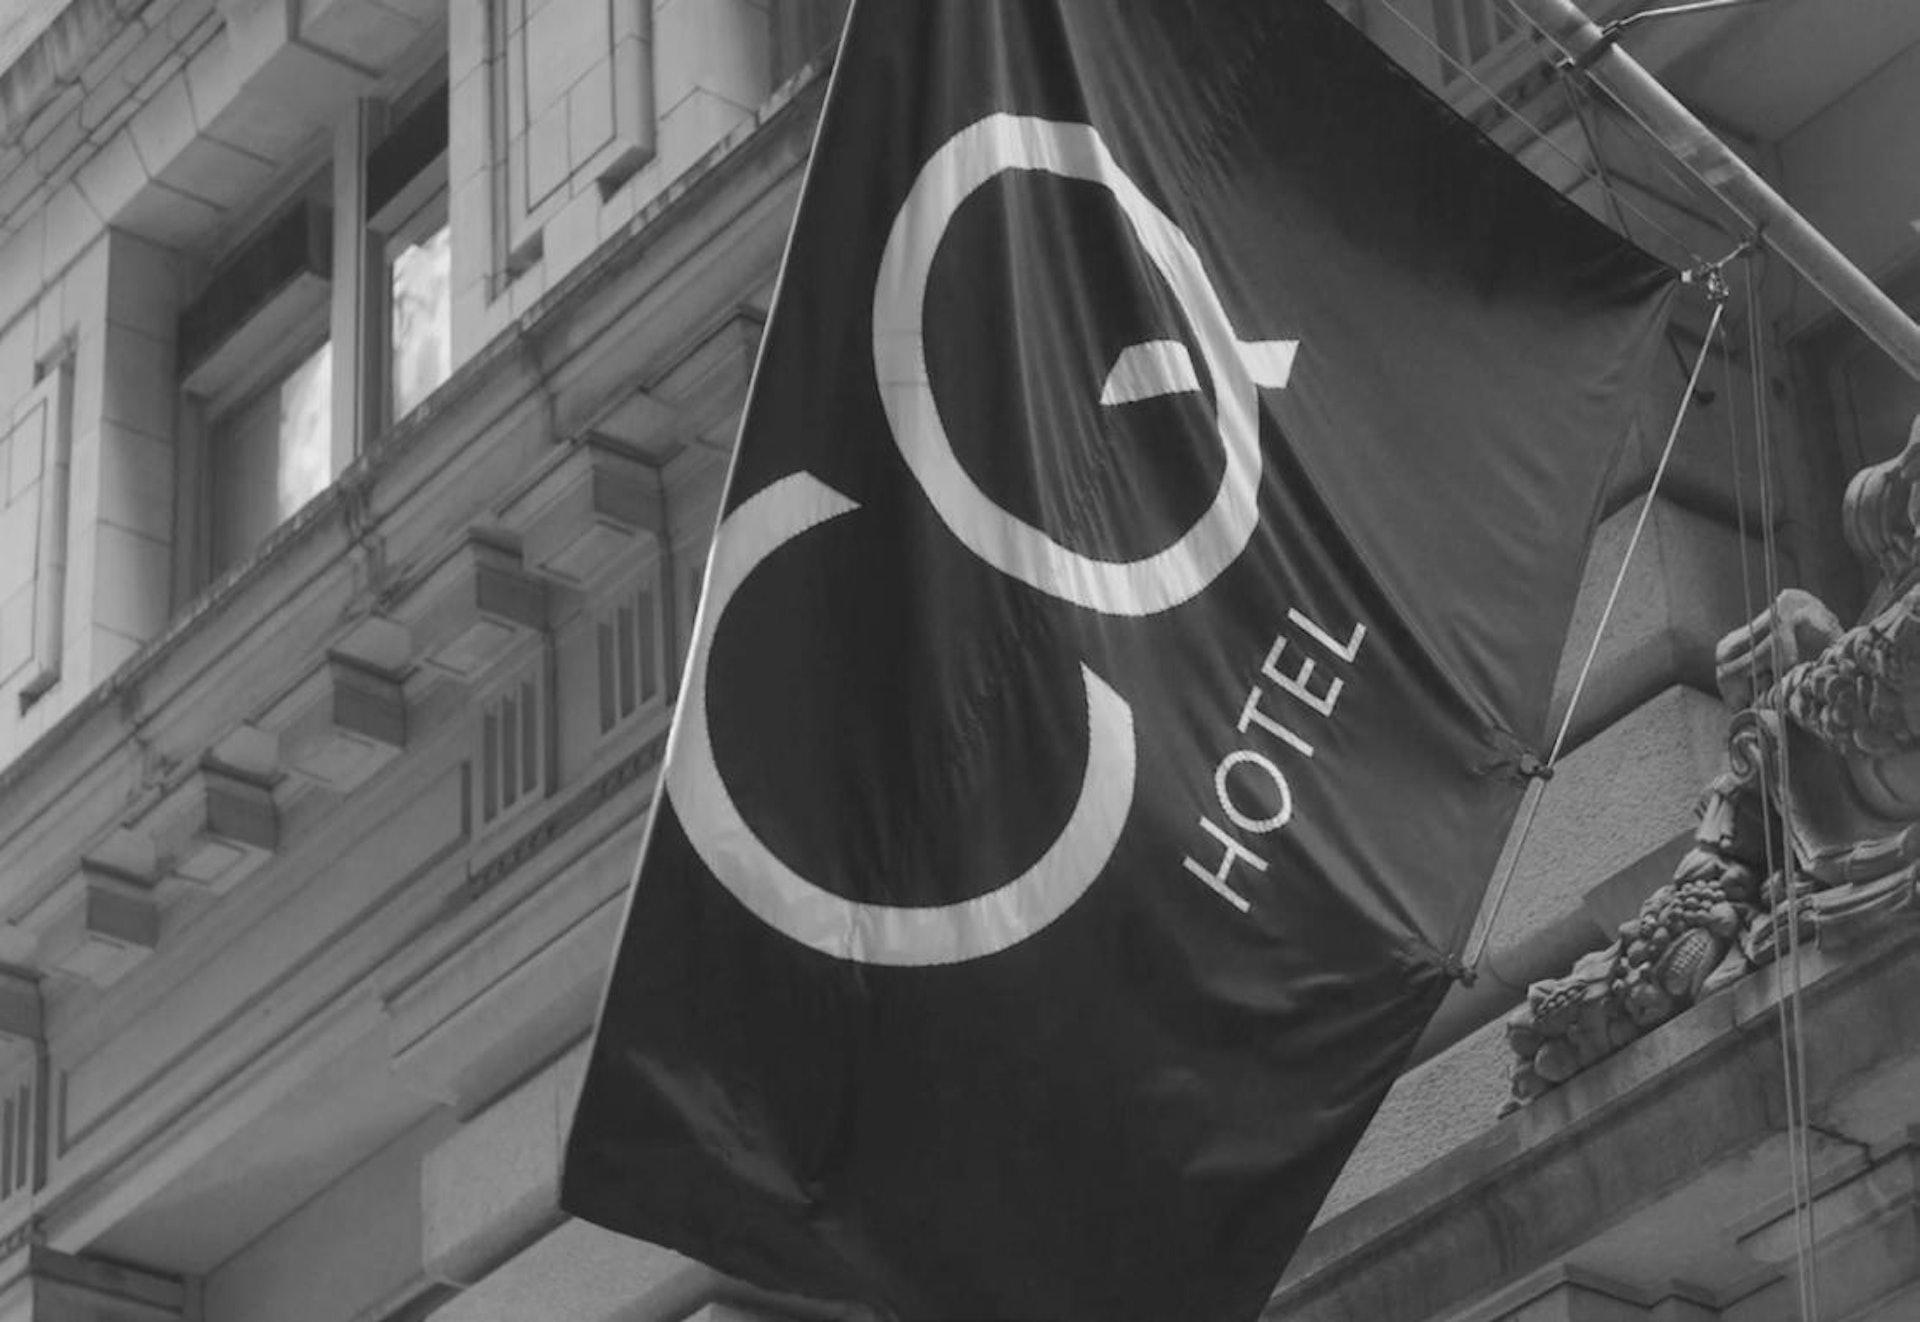 CQ Hotels flag outside a CQ property